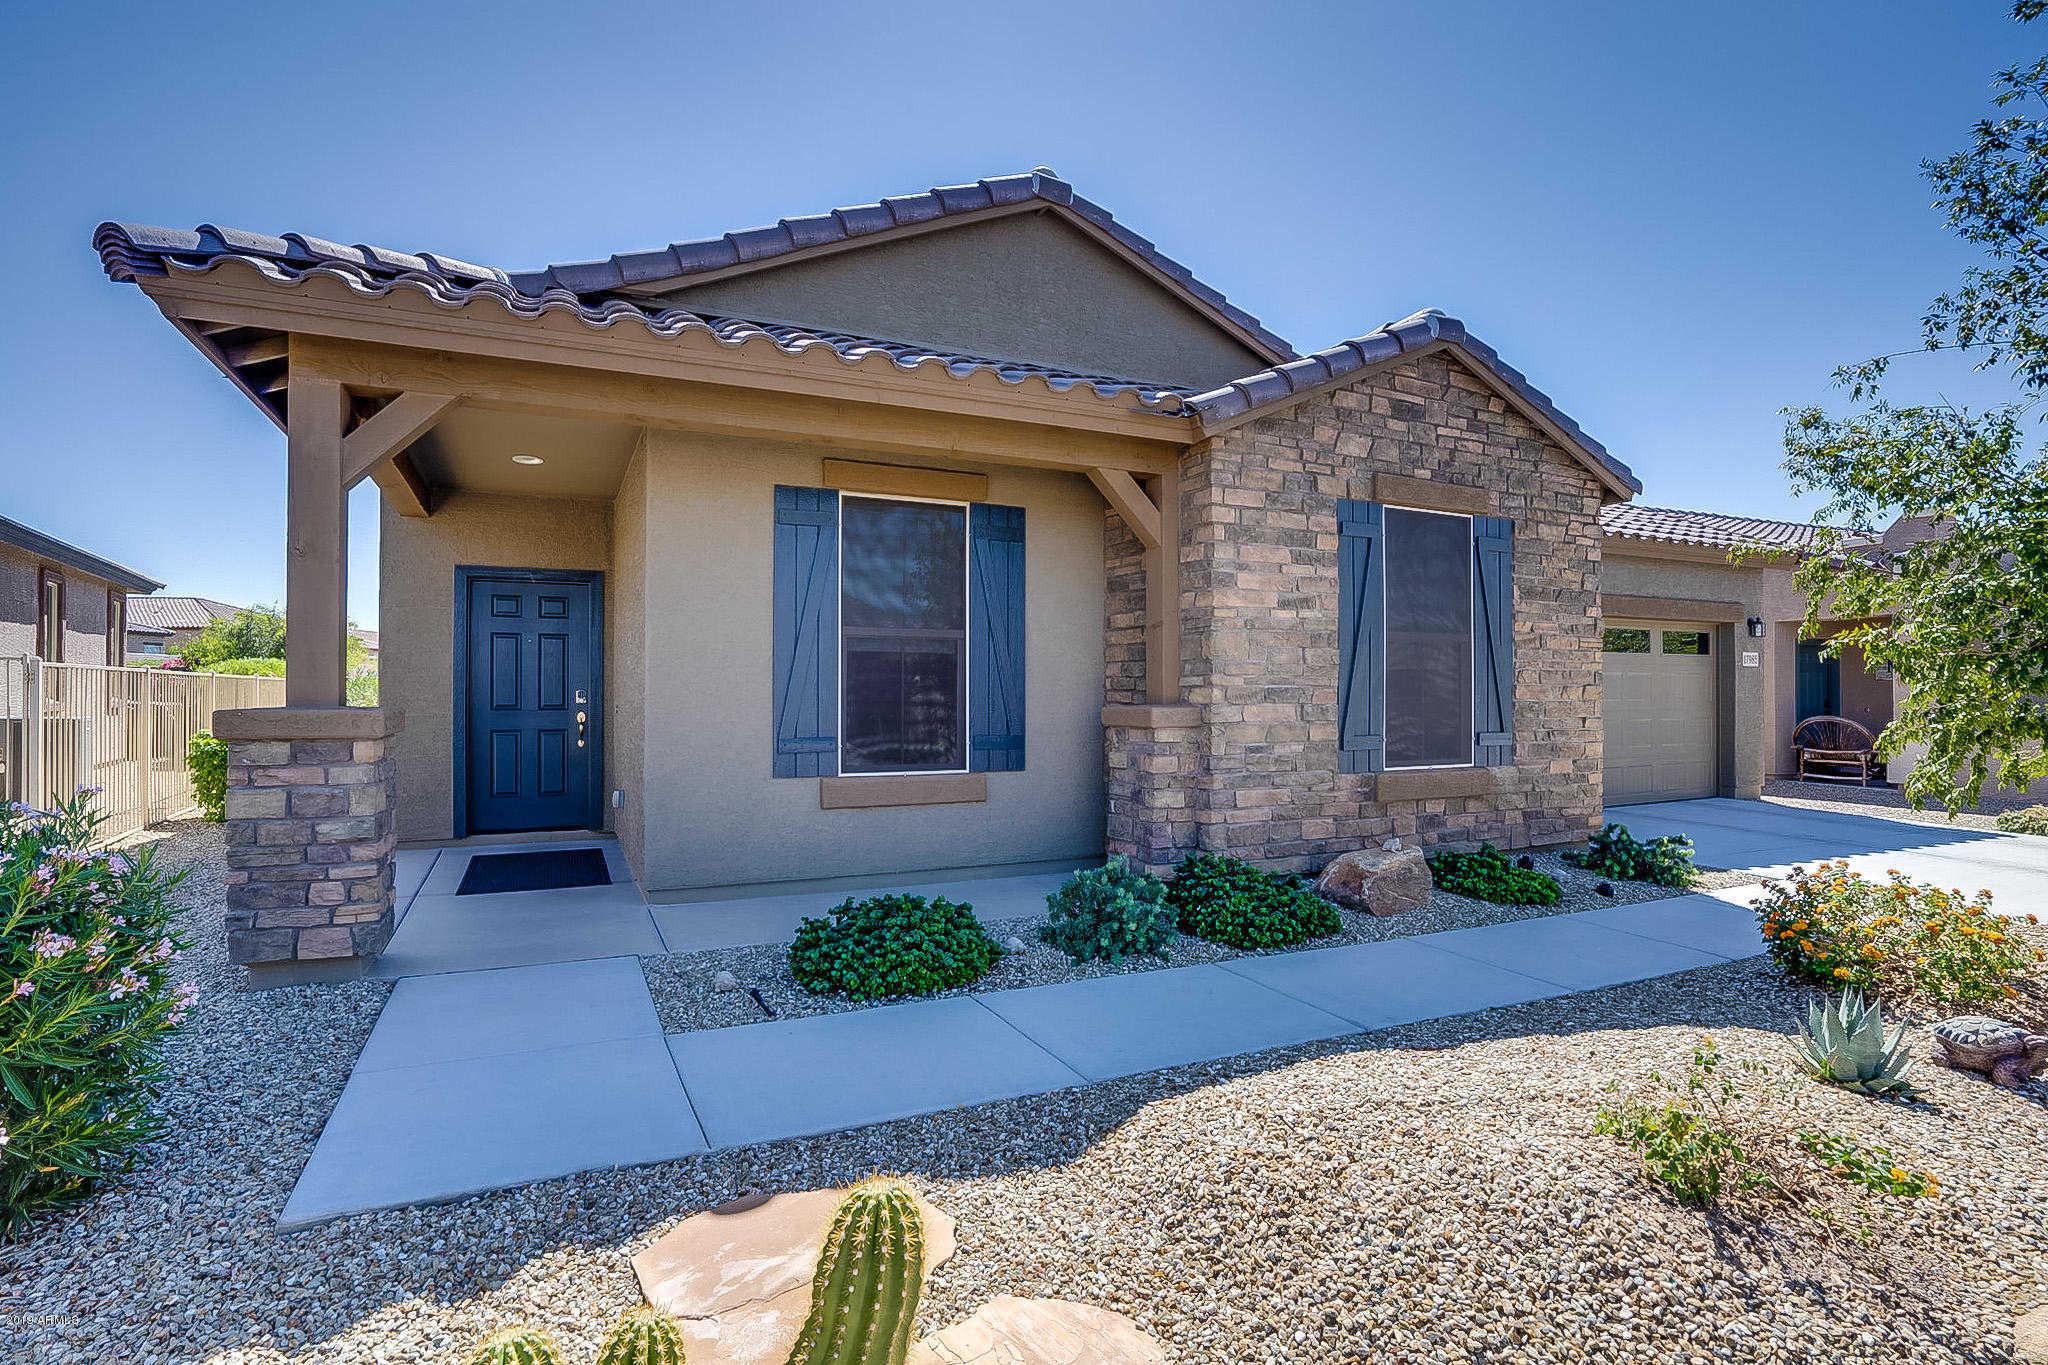 $269,900 - 2Br/2Ba - Home for Sale in Canta Mia Province At Estrella Mountain Ranch Parcel 11, Goodyear